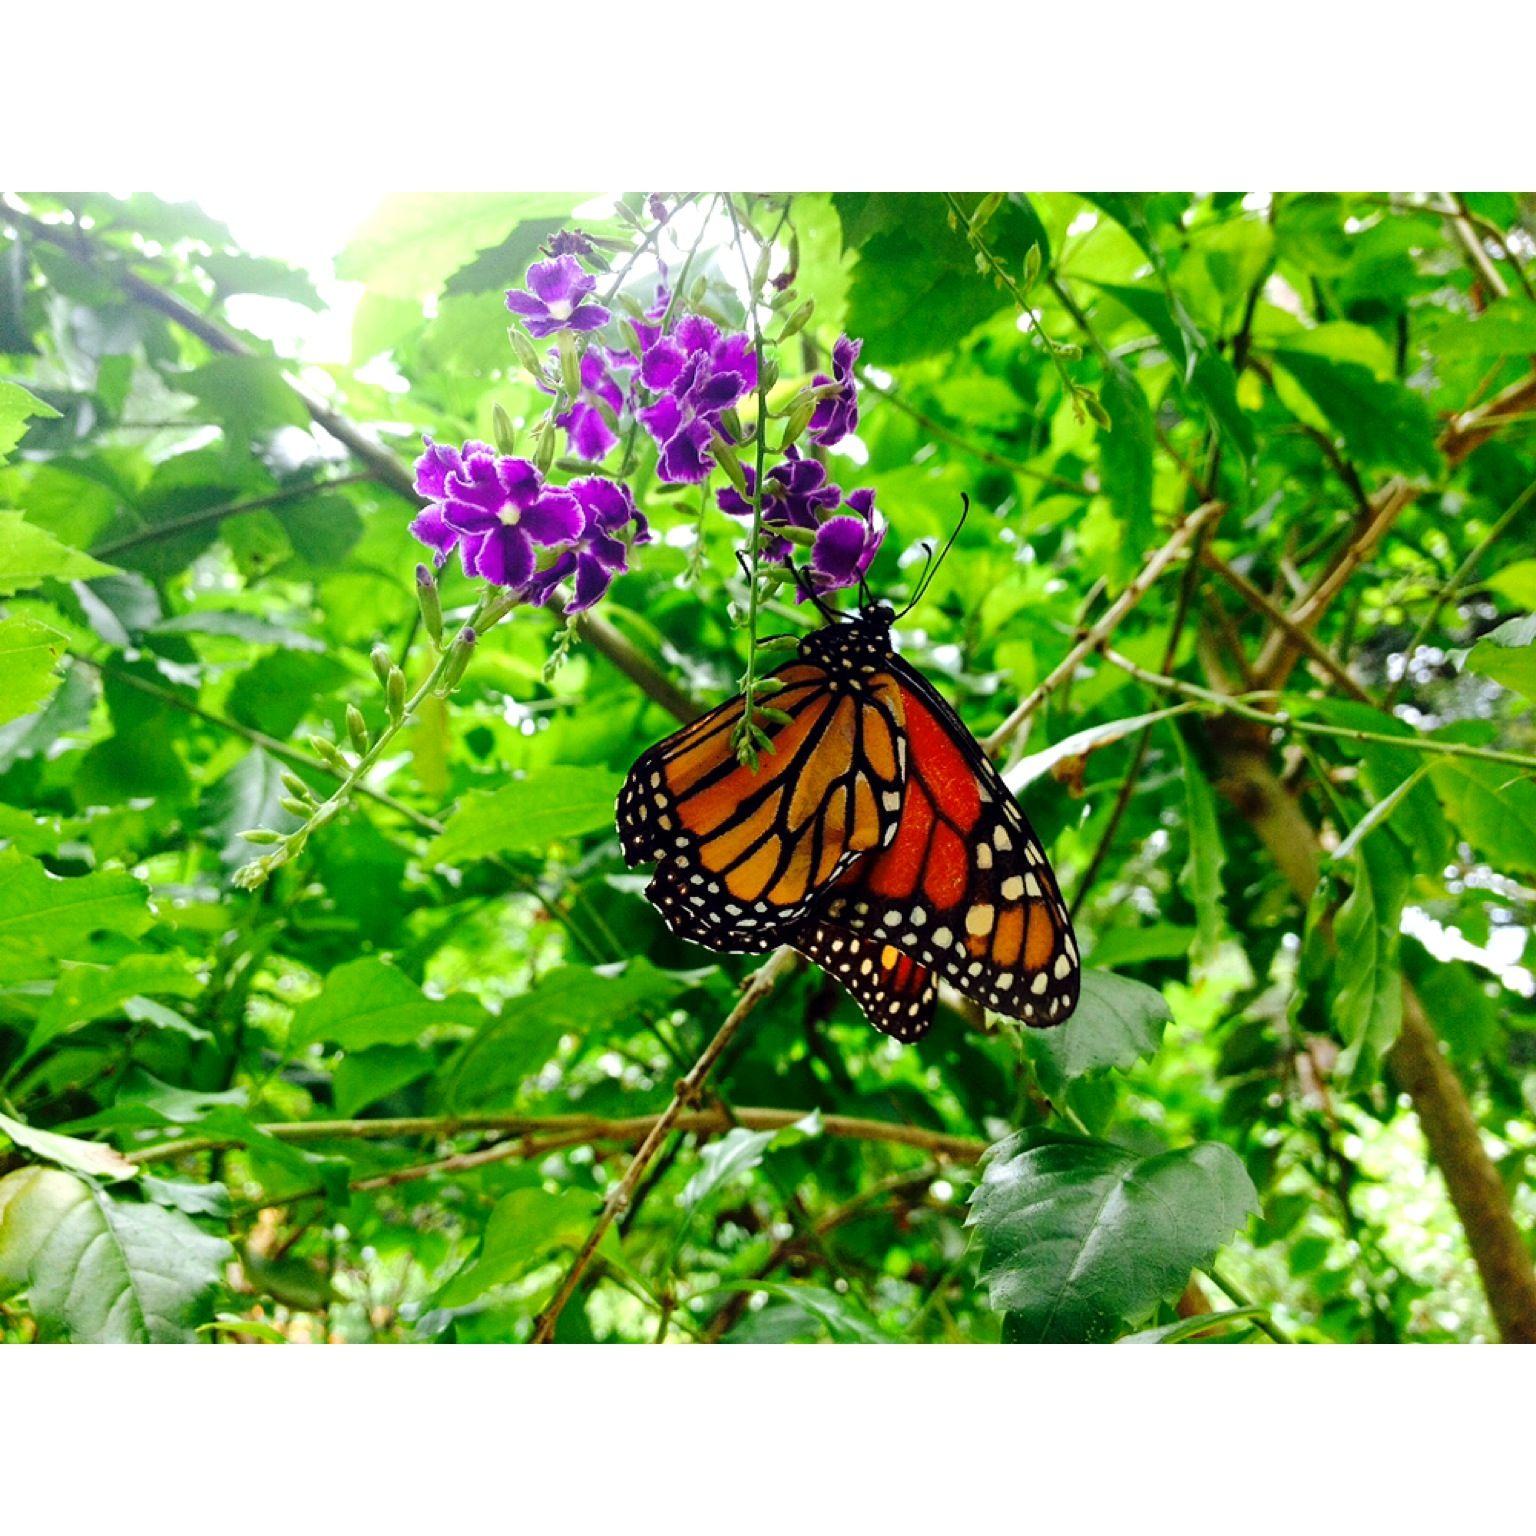 A beautiful butterfly in the Florida sunken gardens ...